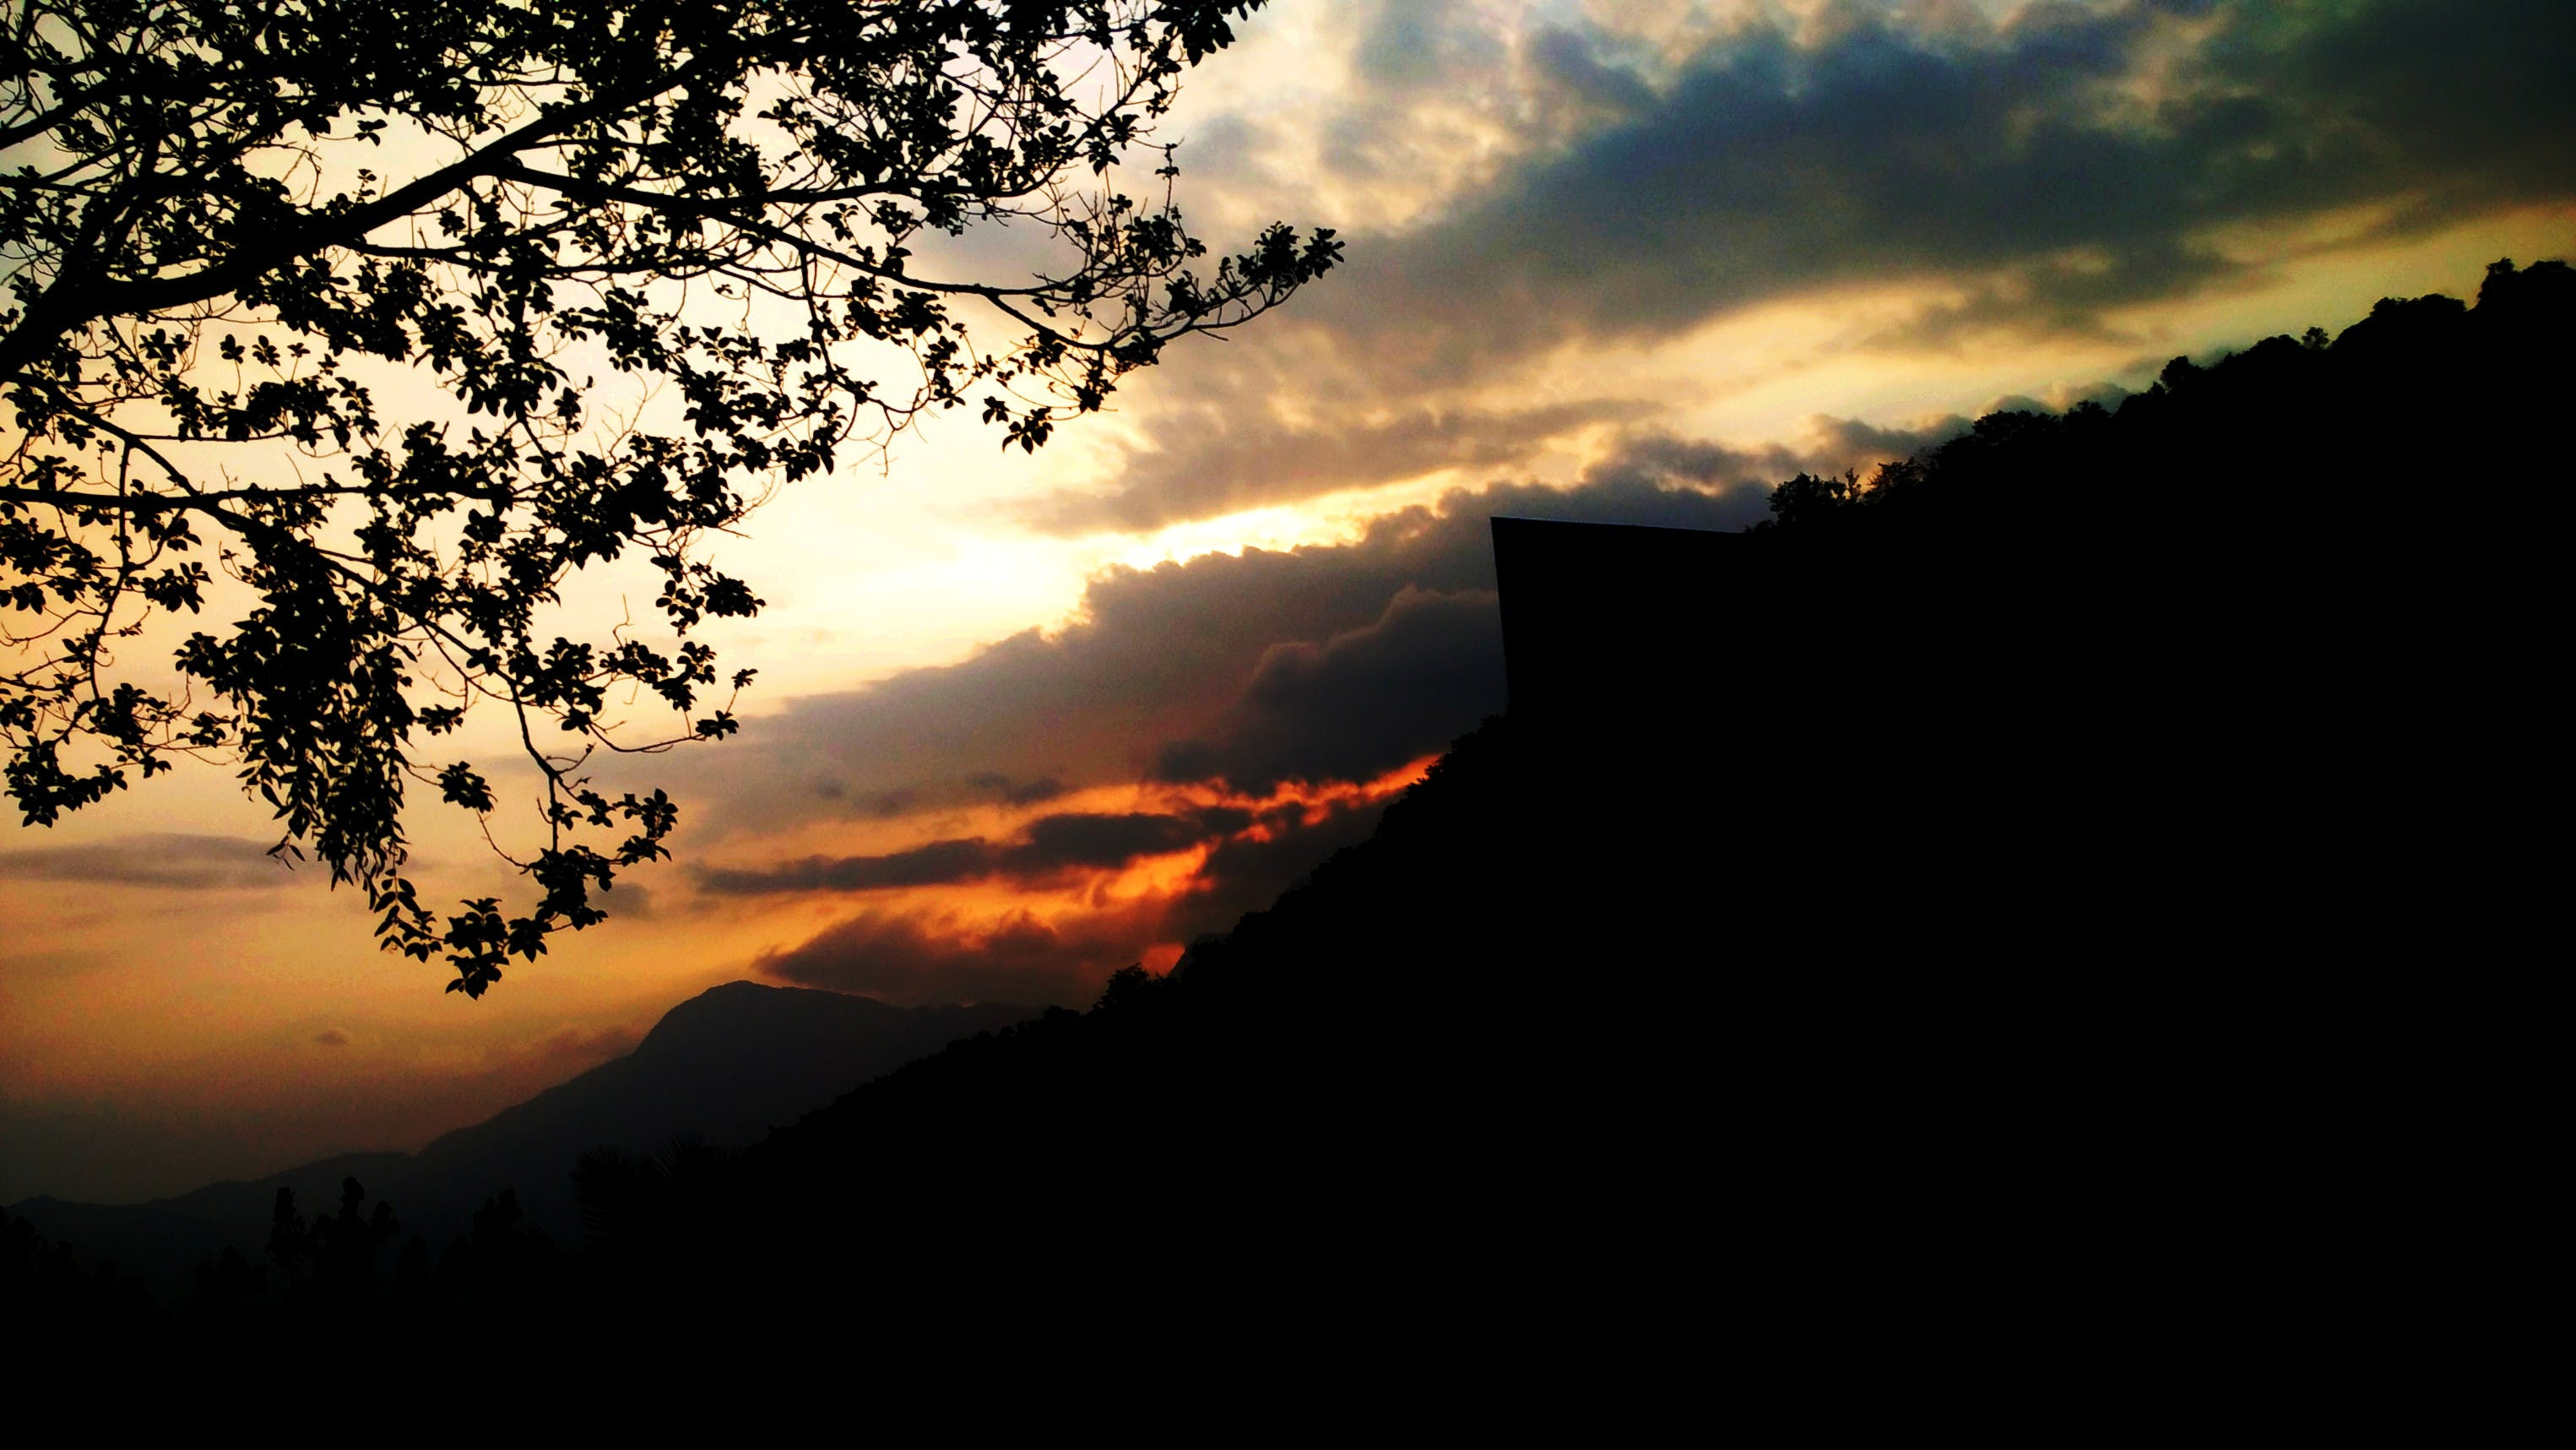 Silhouette View of Landscape Under Golden Hour